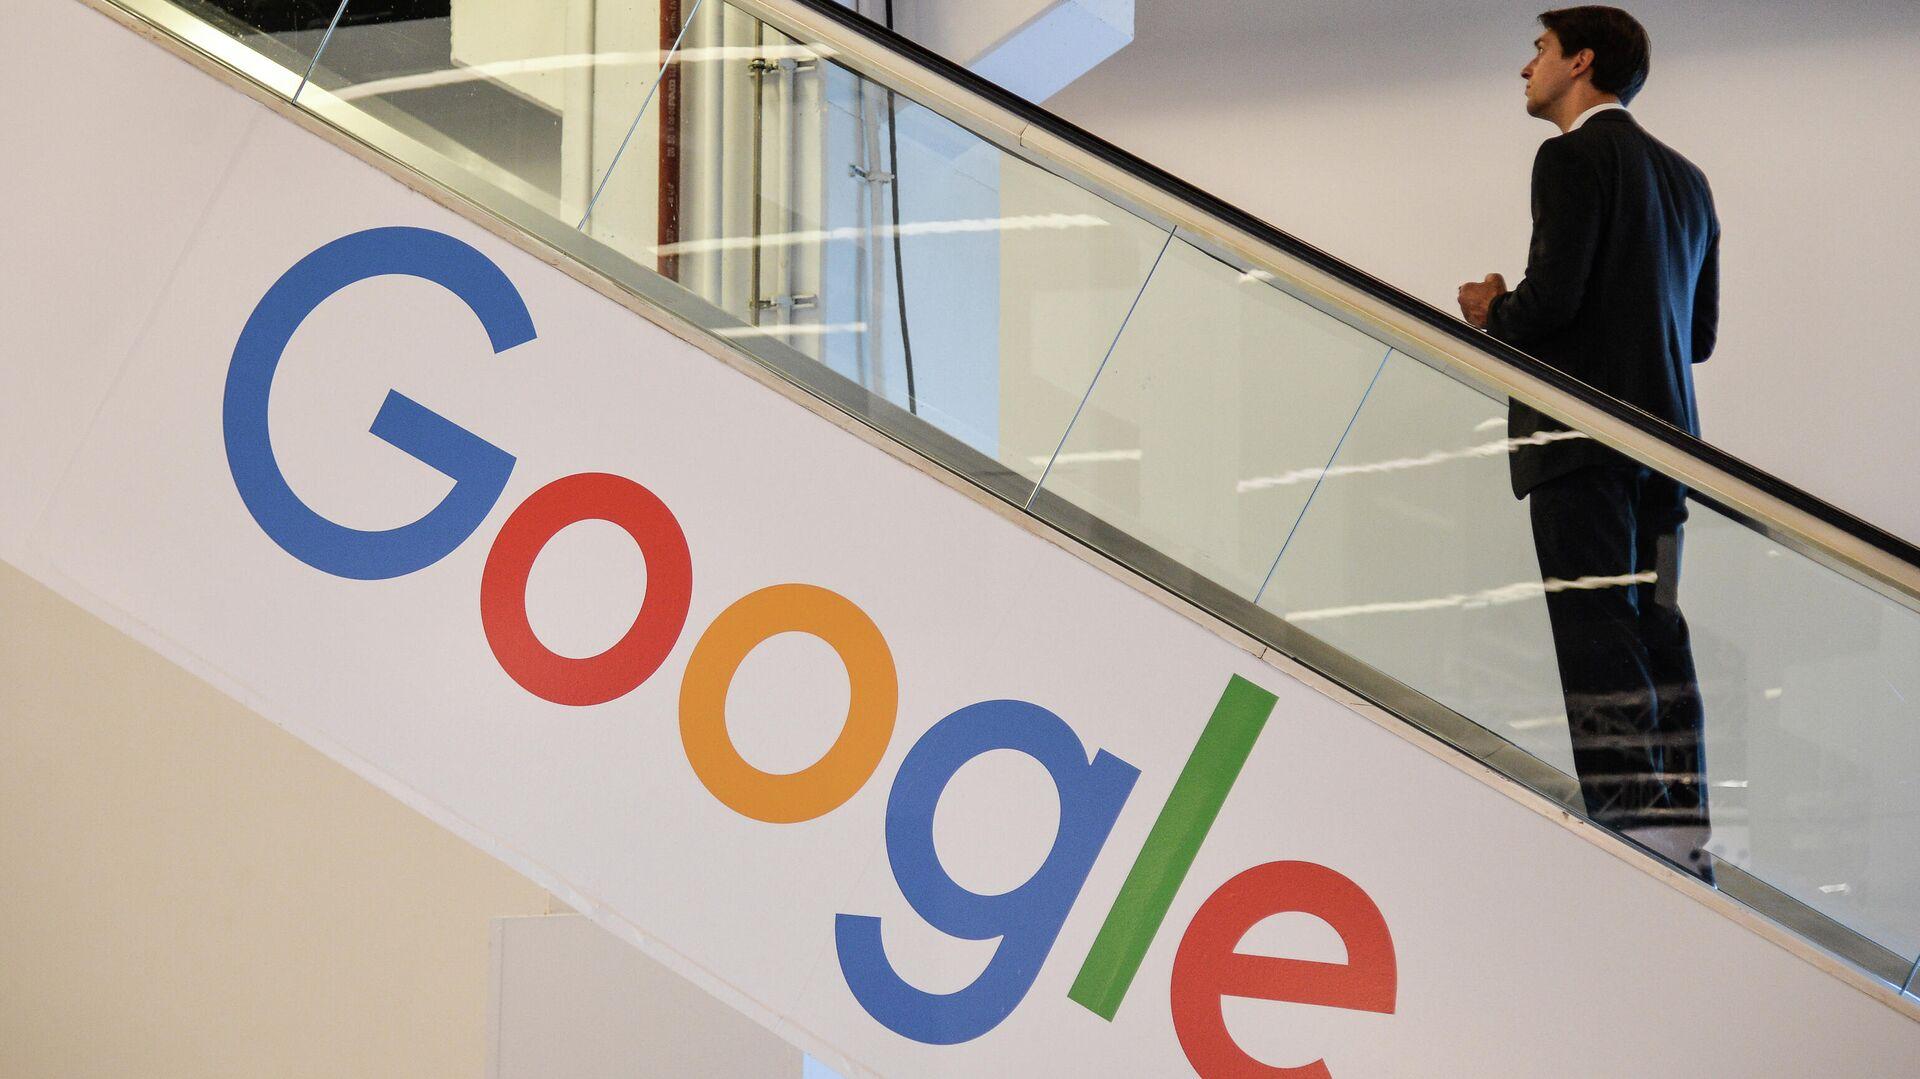 Логотип Google - РИА Новости, 1920, 13.07.2021